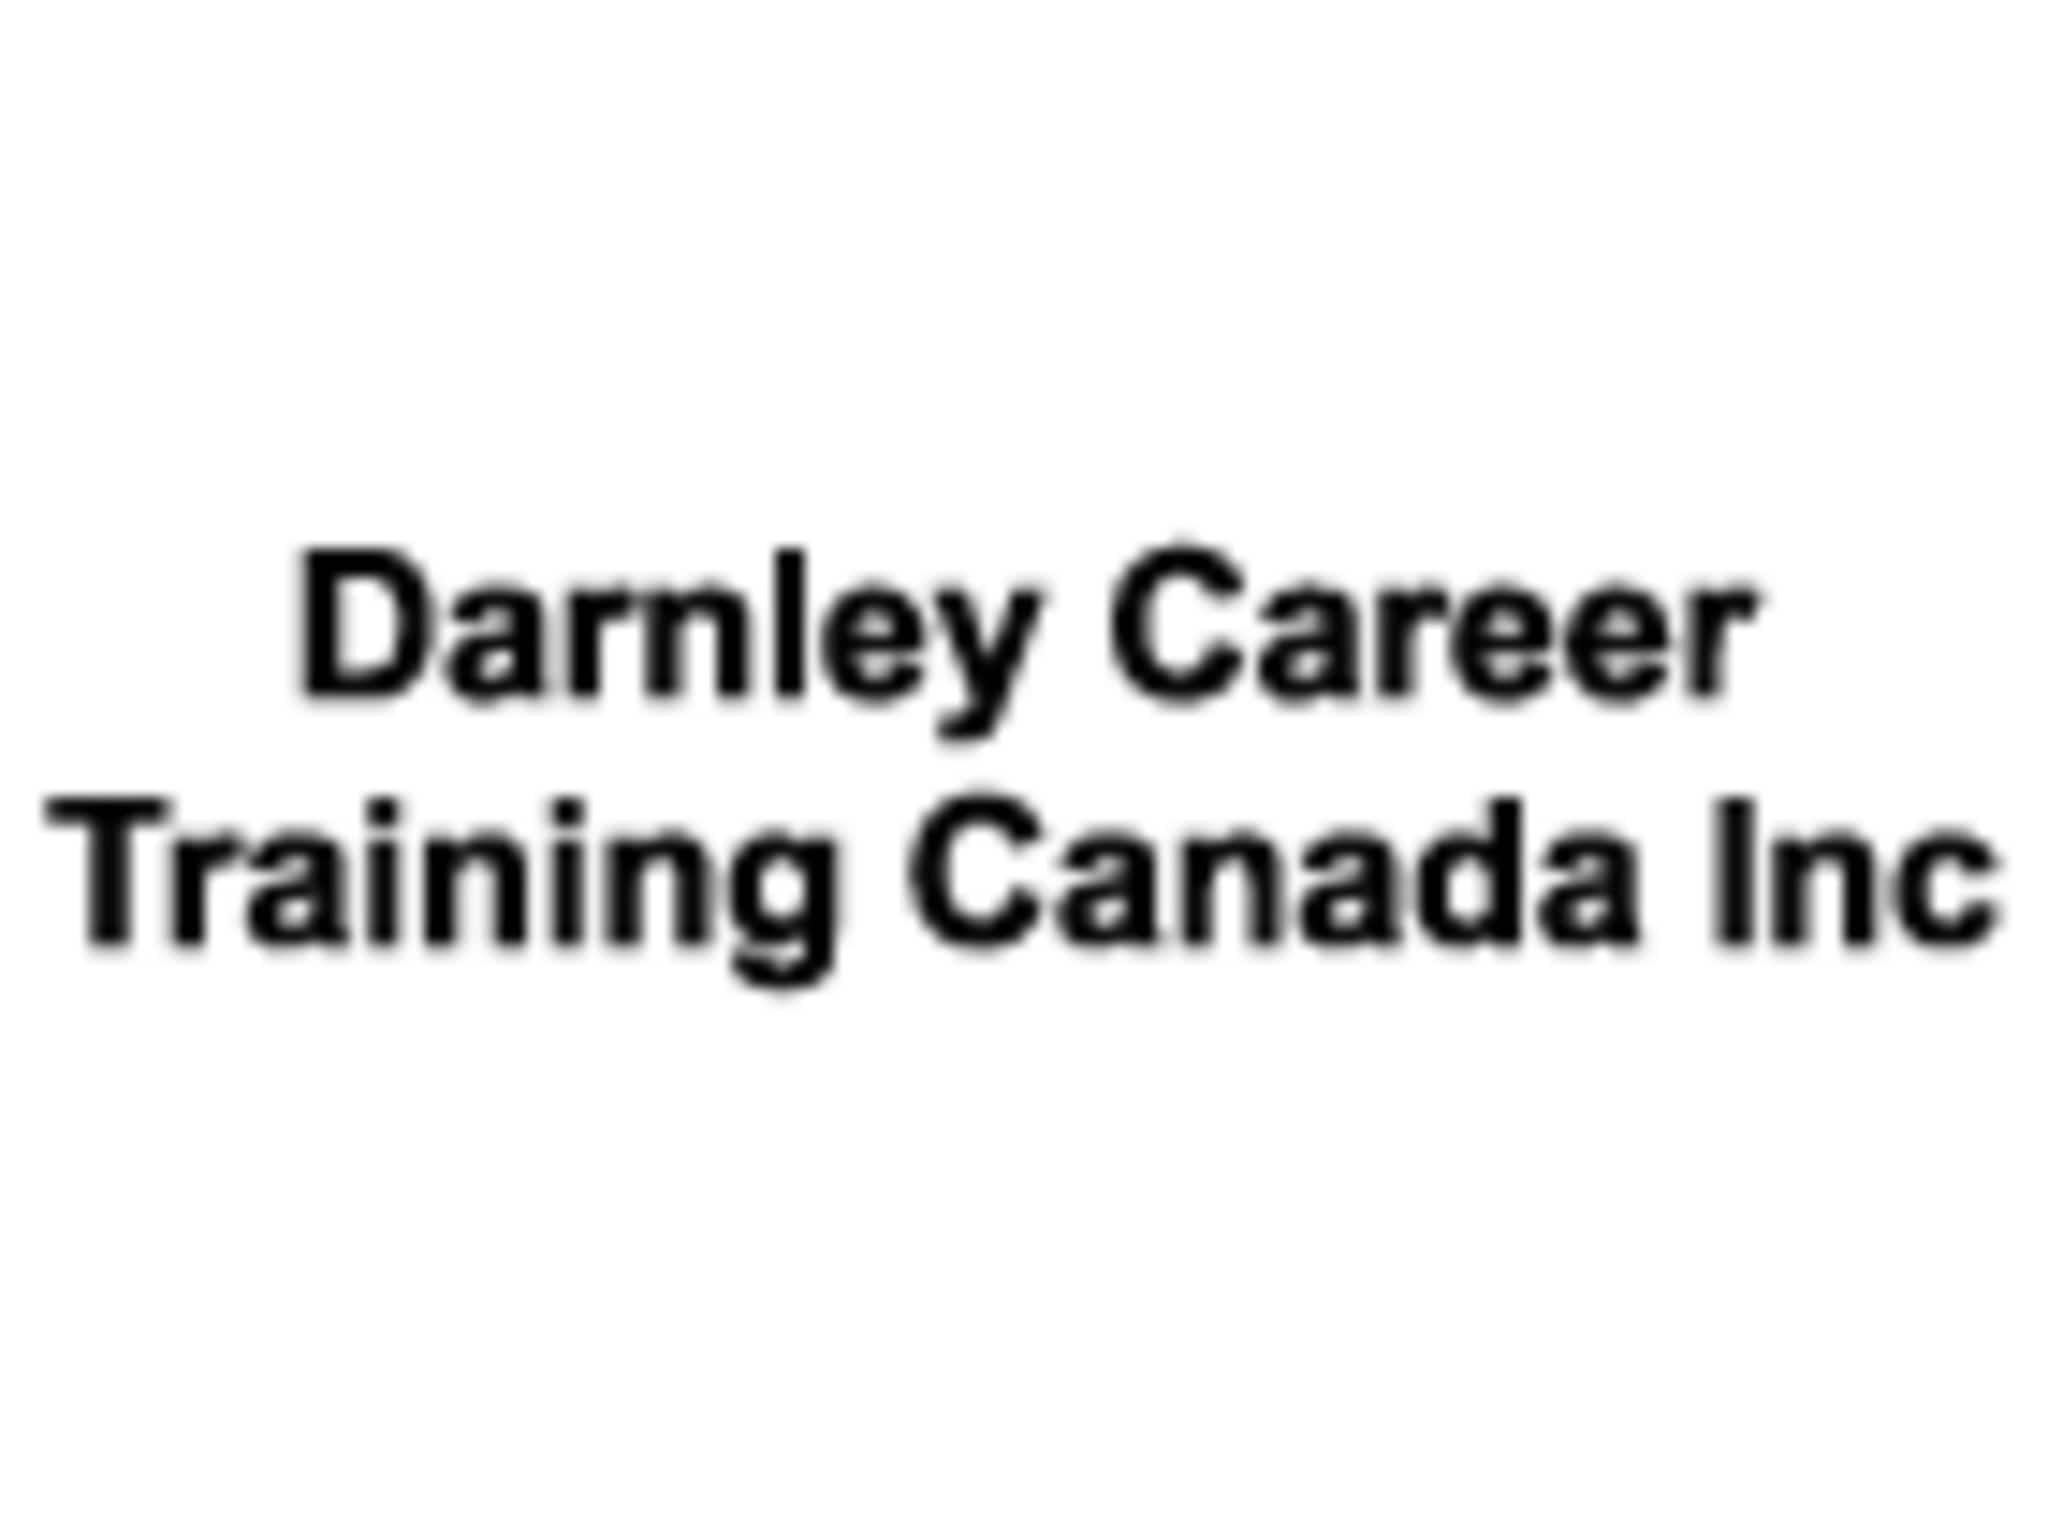 photo Darnley Career Training Canada Inc